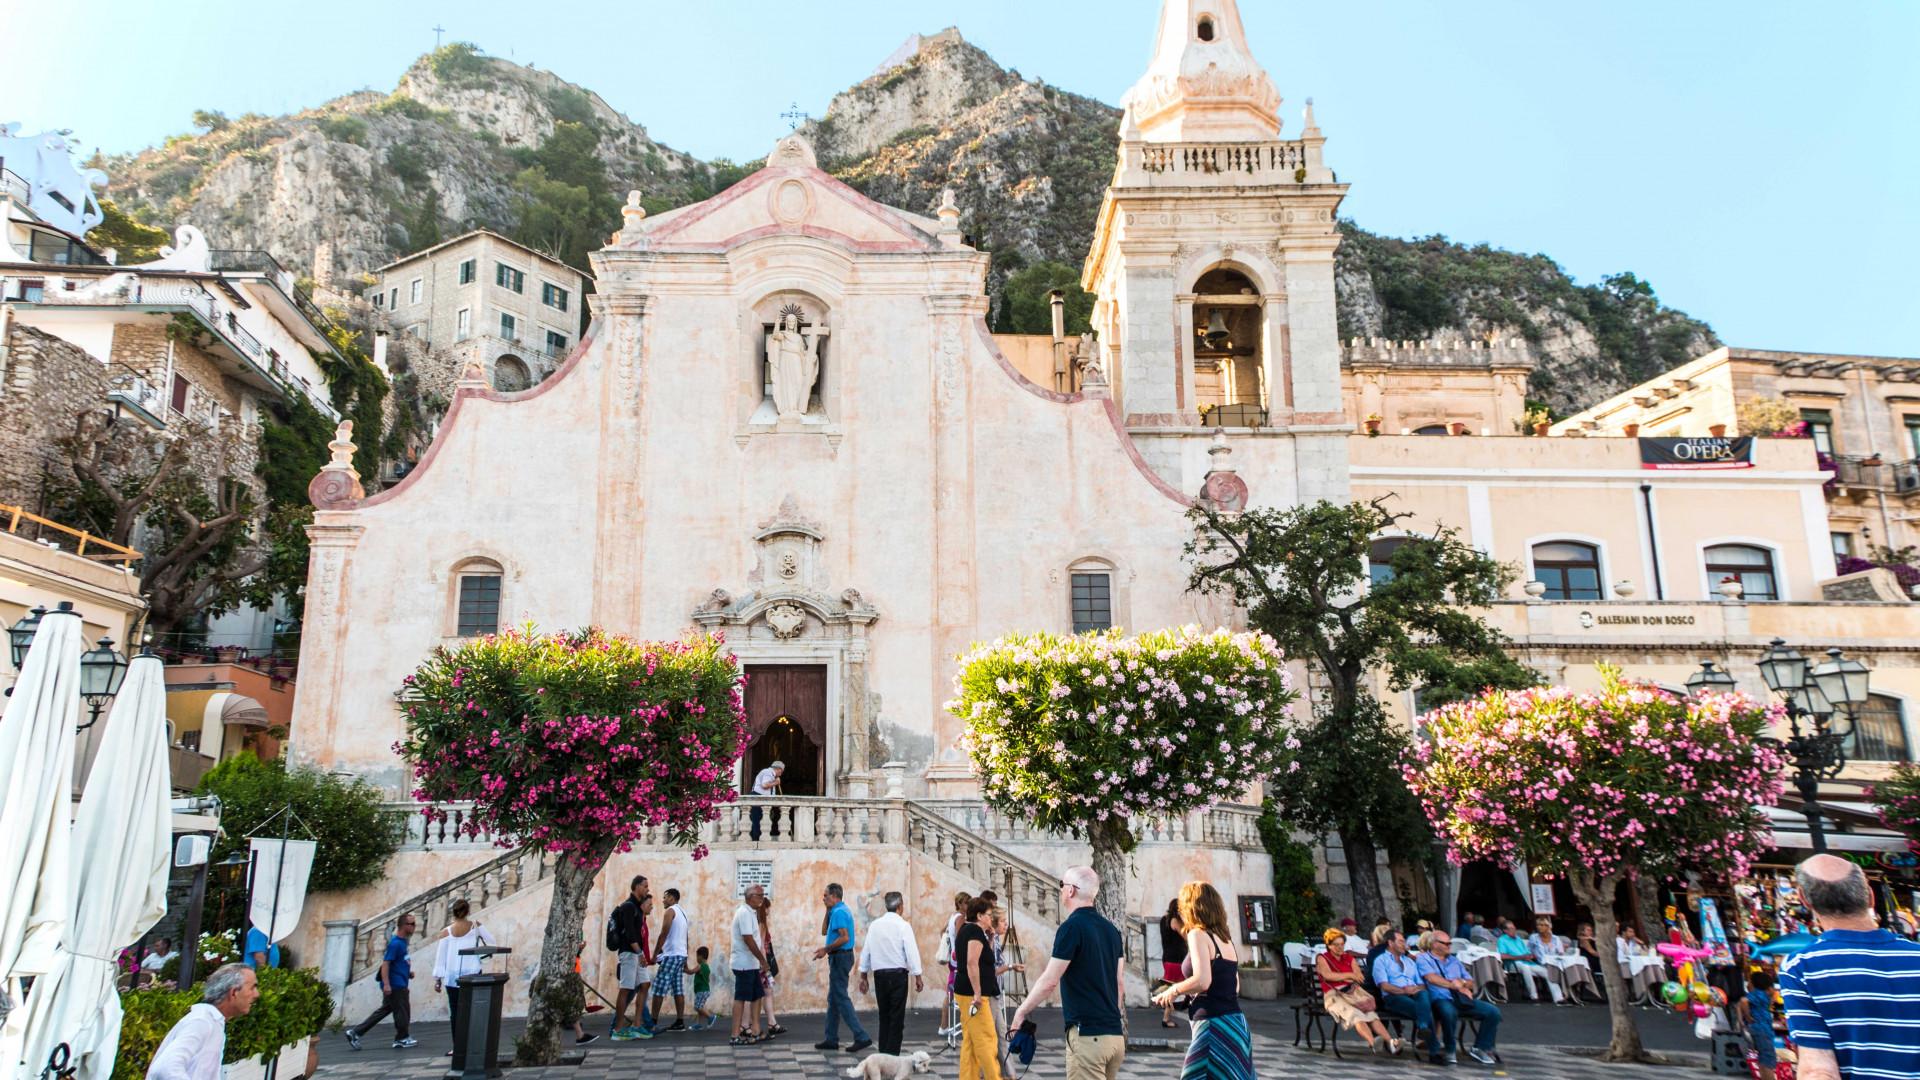 Sicily sights